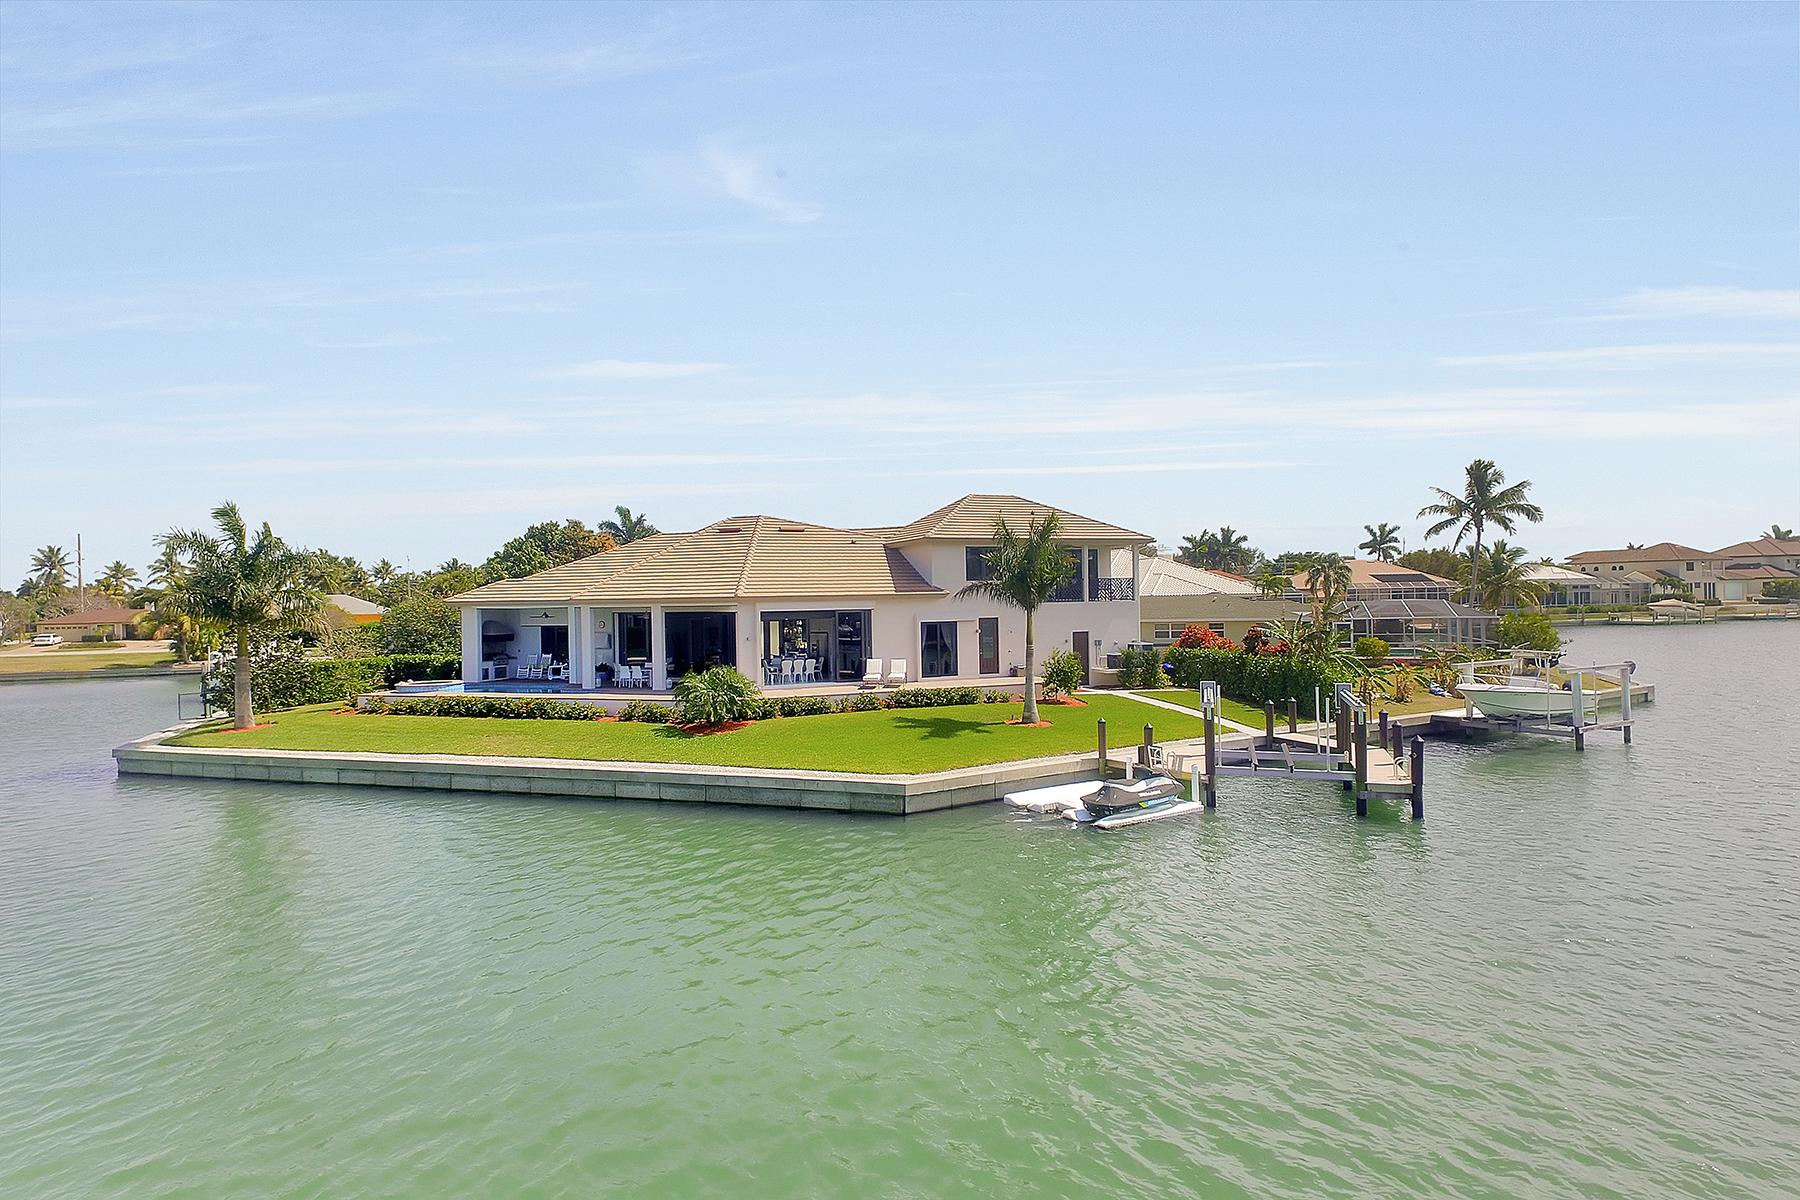 1270 Lily Ct, Marco Island, FL 34145